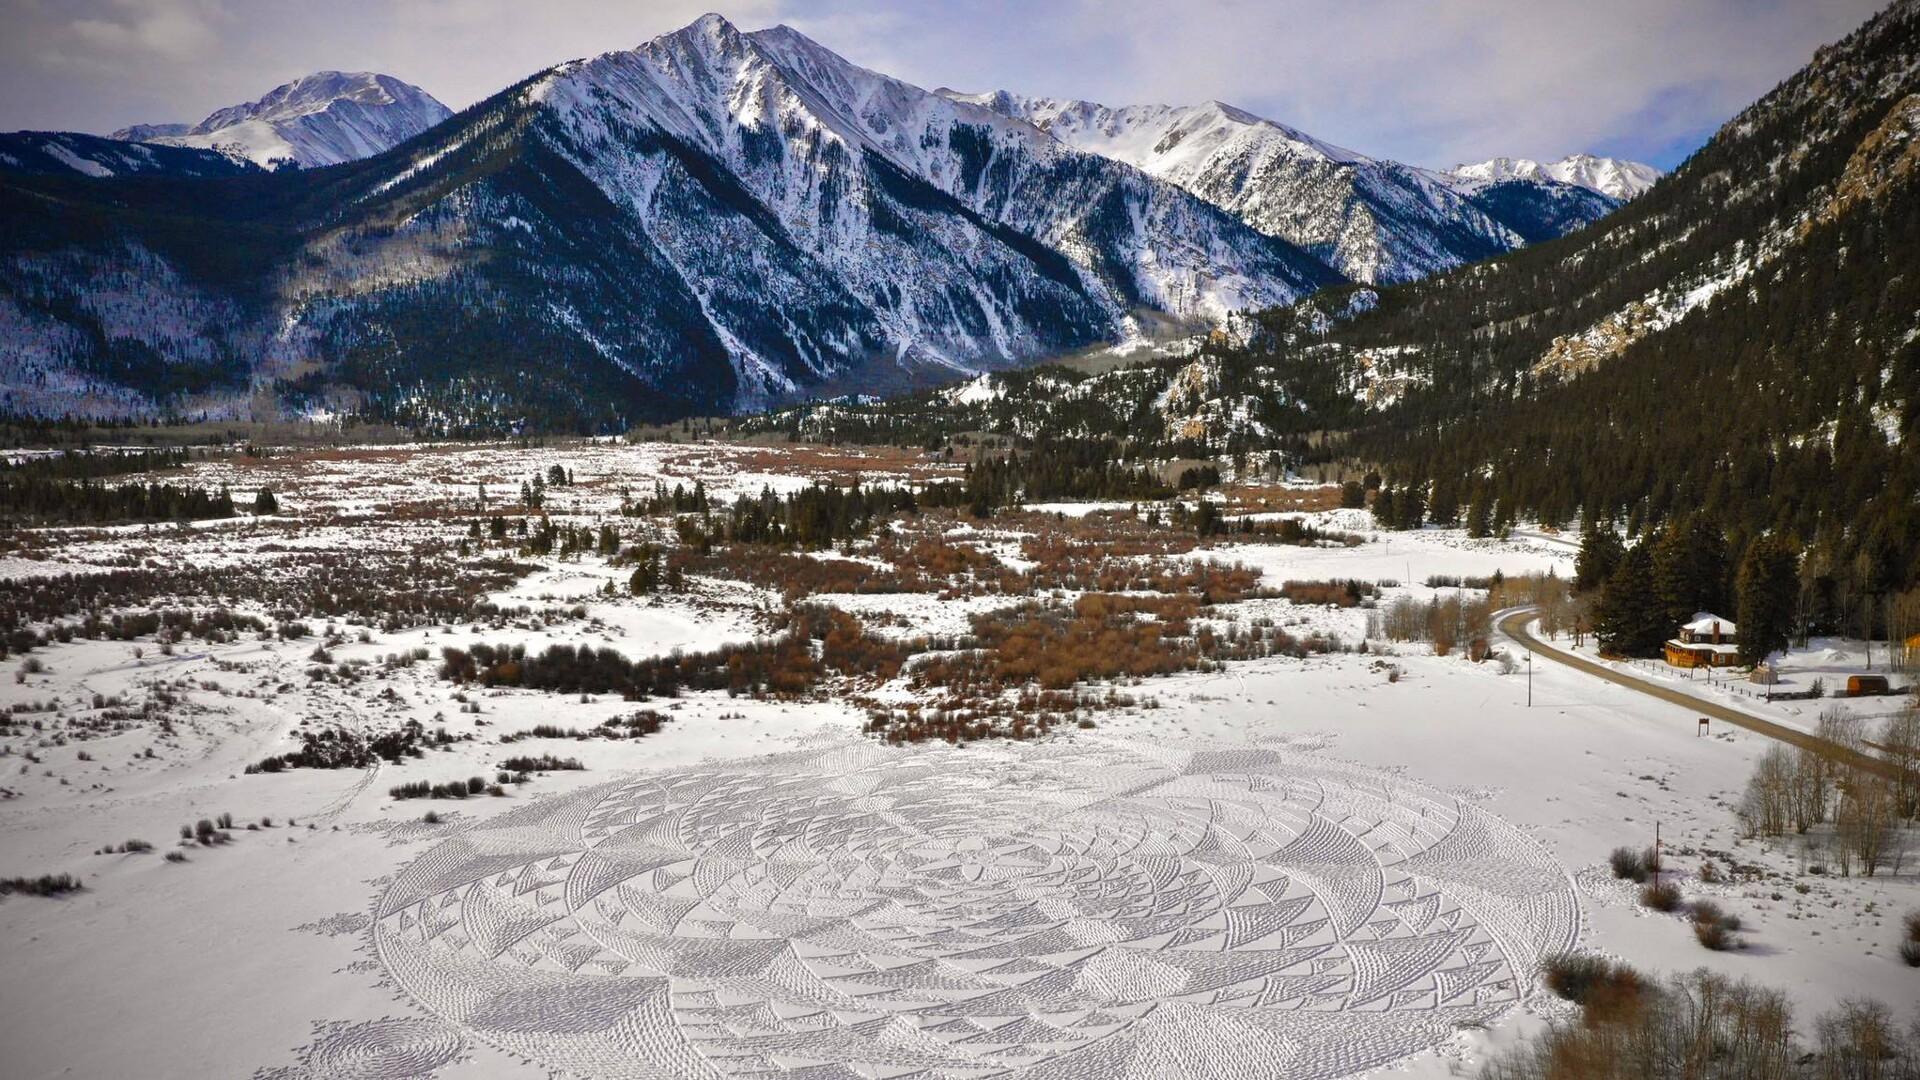 Simon Beck Snow Art at Twin Lakes Michael Randol.jpg